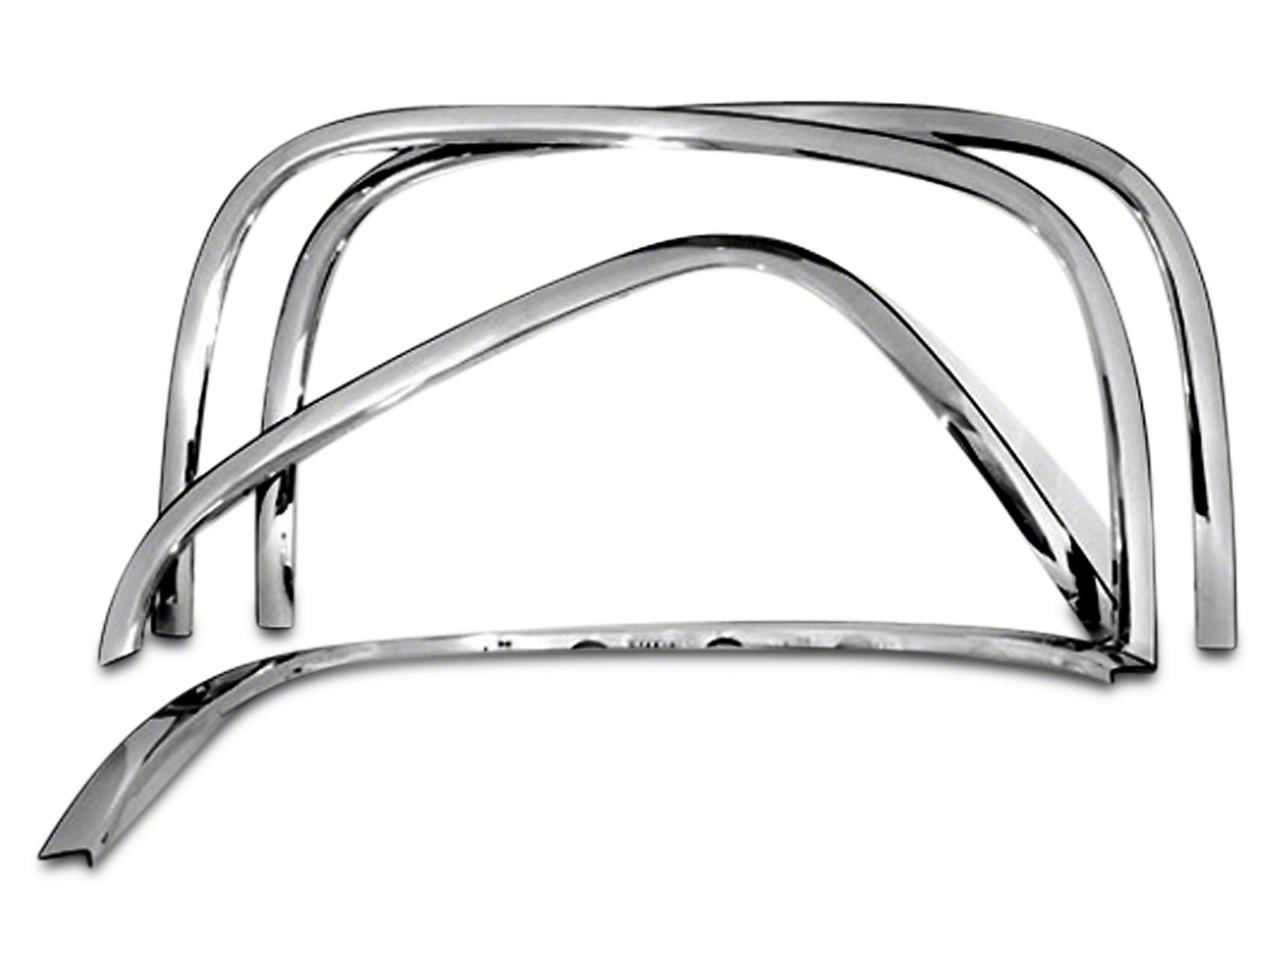 Stainless Steel Fender Trim - Chrome (07-13 Silverado 1500)